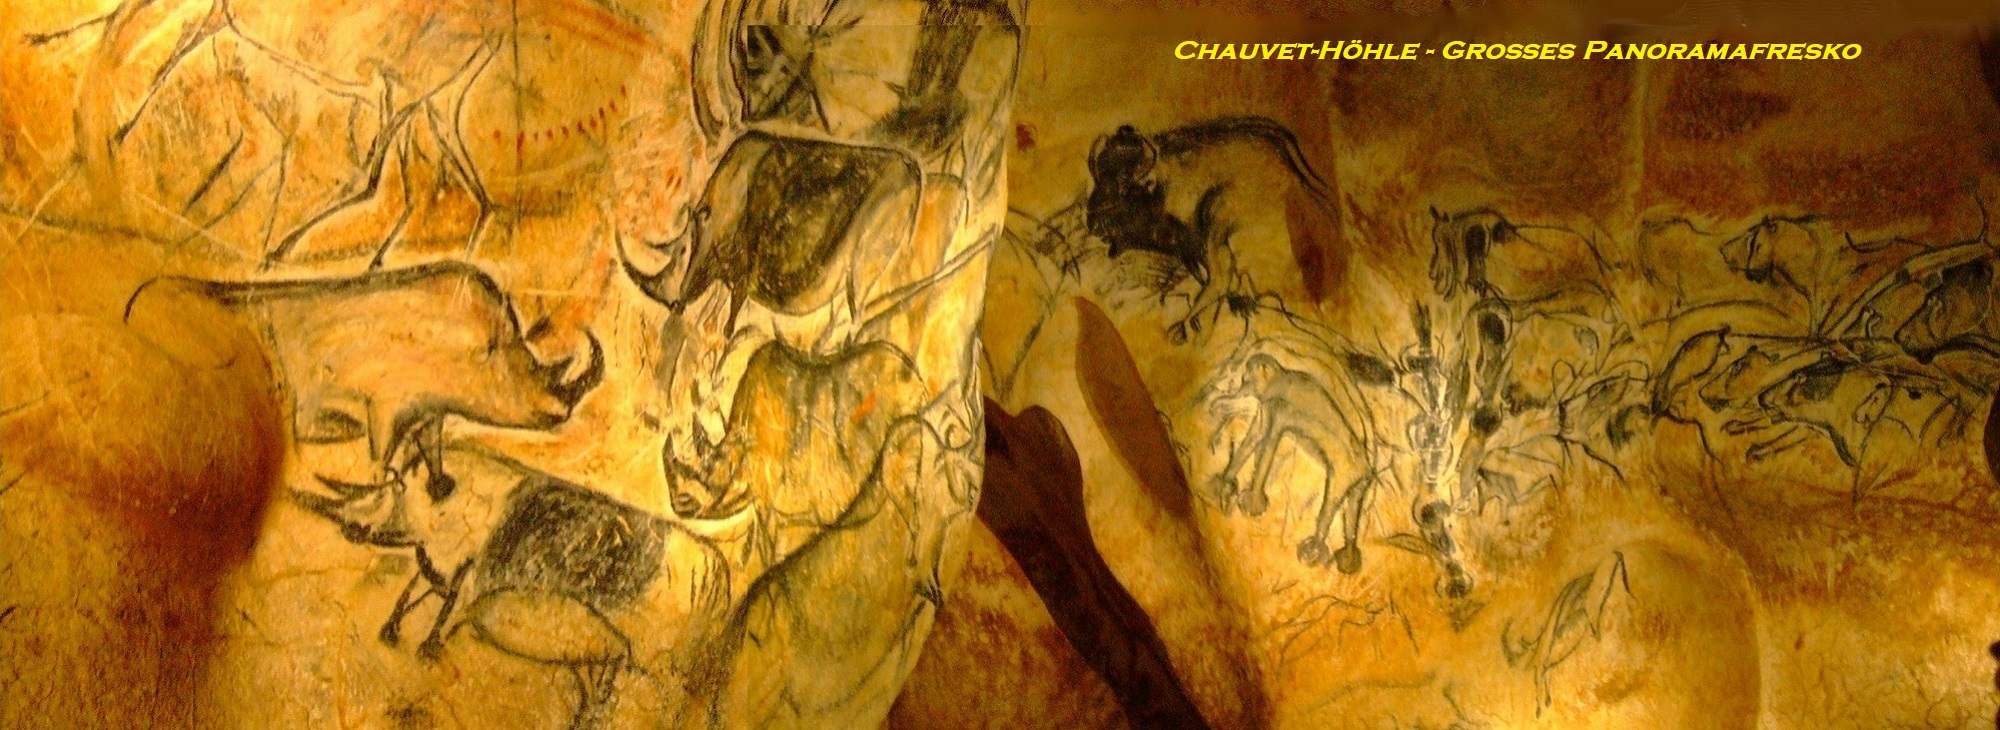 Chauvet-Höhle - Großes Panoramafresko